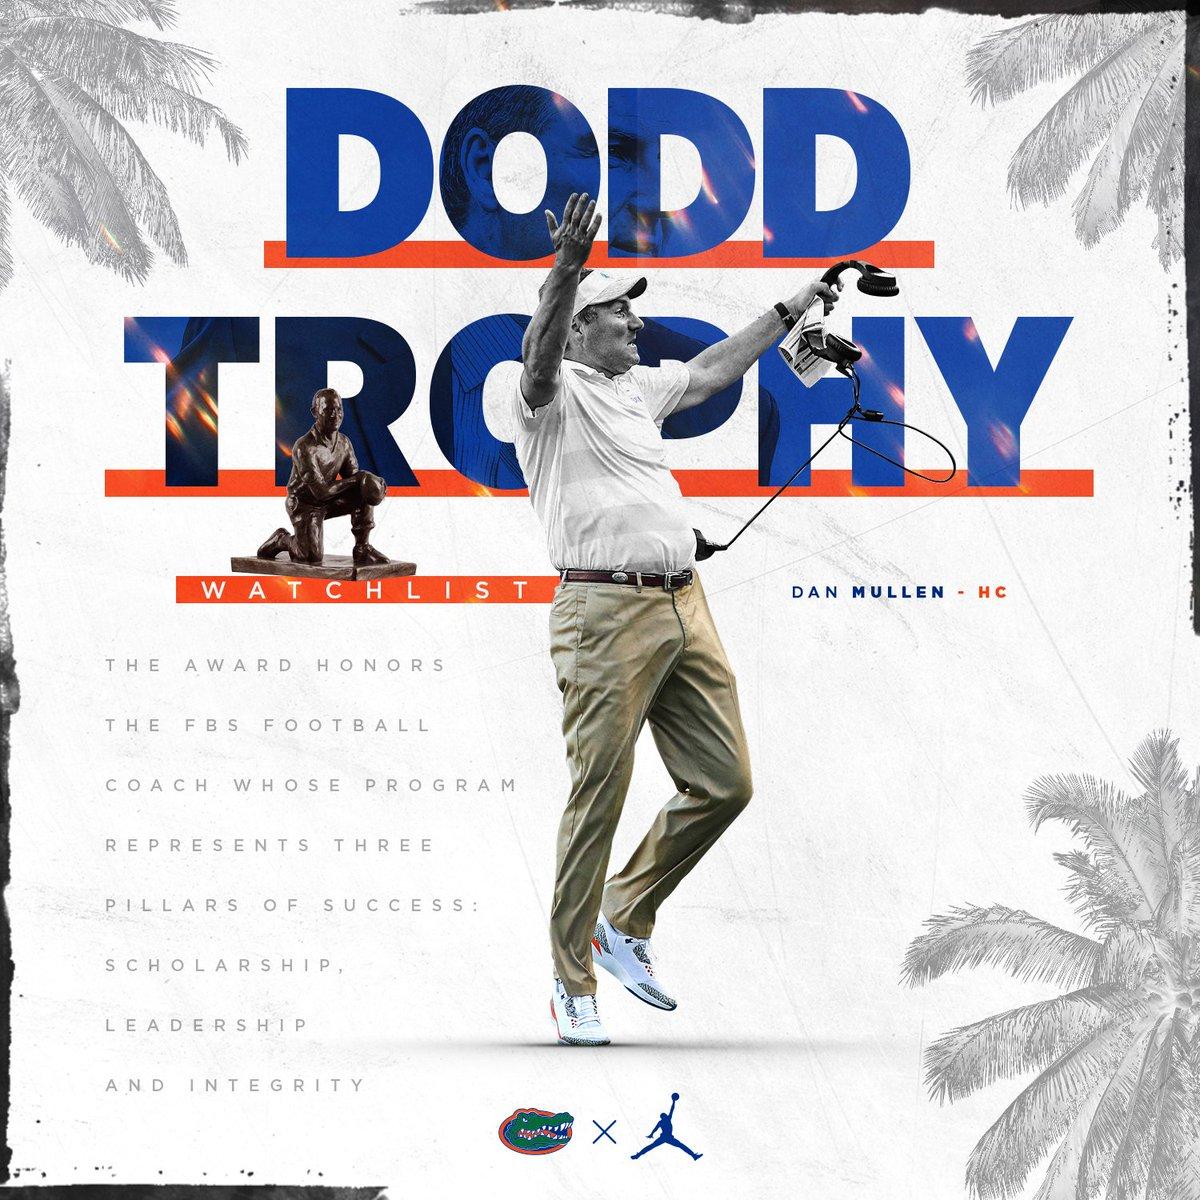 Watch Lists Revealed: 🏆 @DoddTrophy 🐊 @CoachDanMullen Story: bit.ly/315zzNx 🏆 @WuerffelTrophy 🐊 @Tyrie_1 Story: bit.ly/2Zdd34z 🏆 @hornungaward 🐊 @0fficialC2N Story: bit.ly/2Zdd34z #GatorStandard